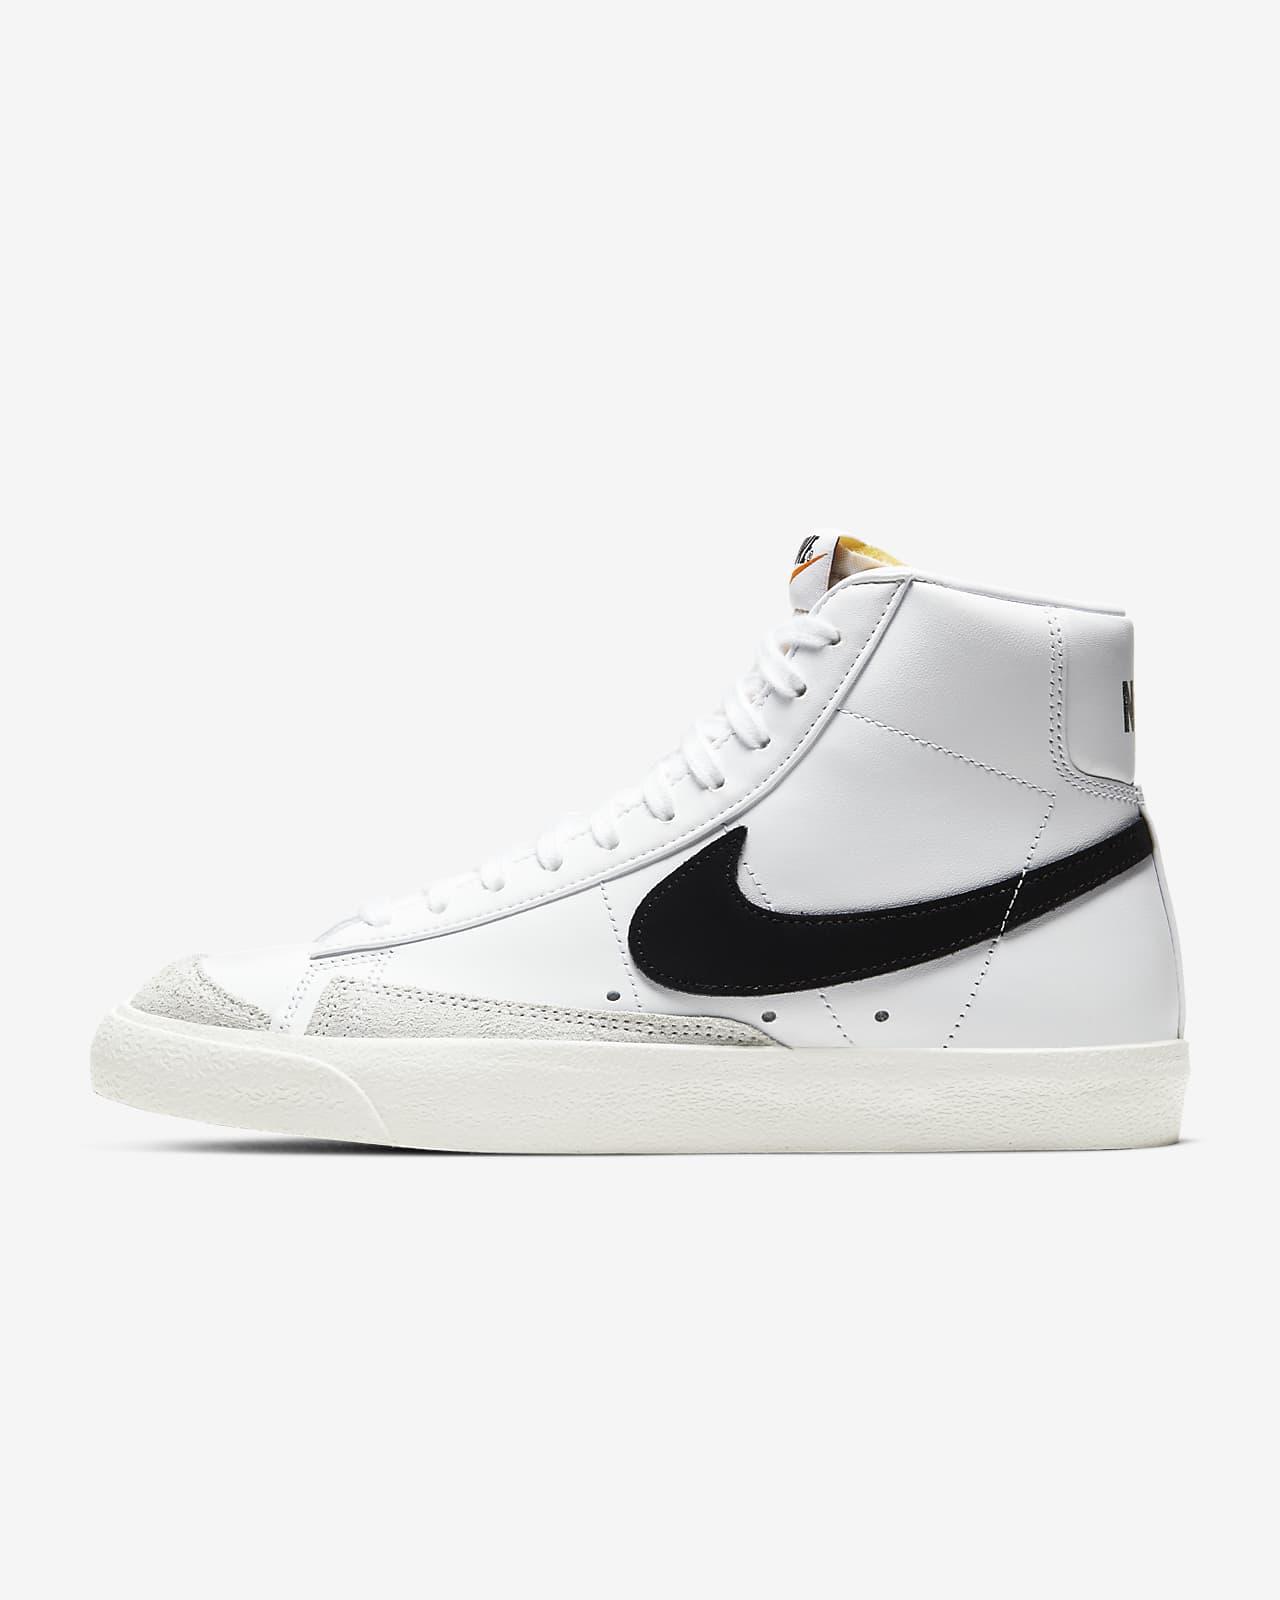 Nike Blazer Mid '77 Vintage Women's Shoe